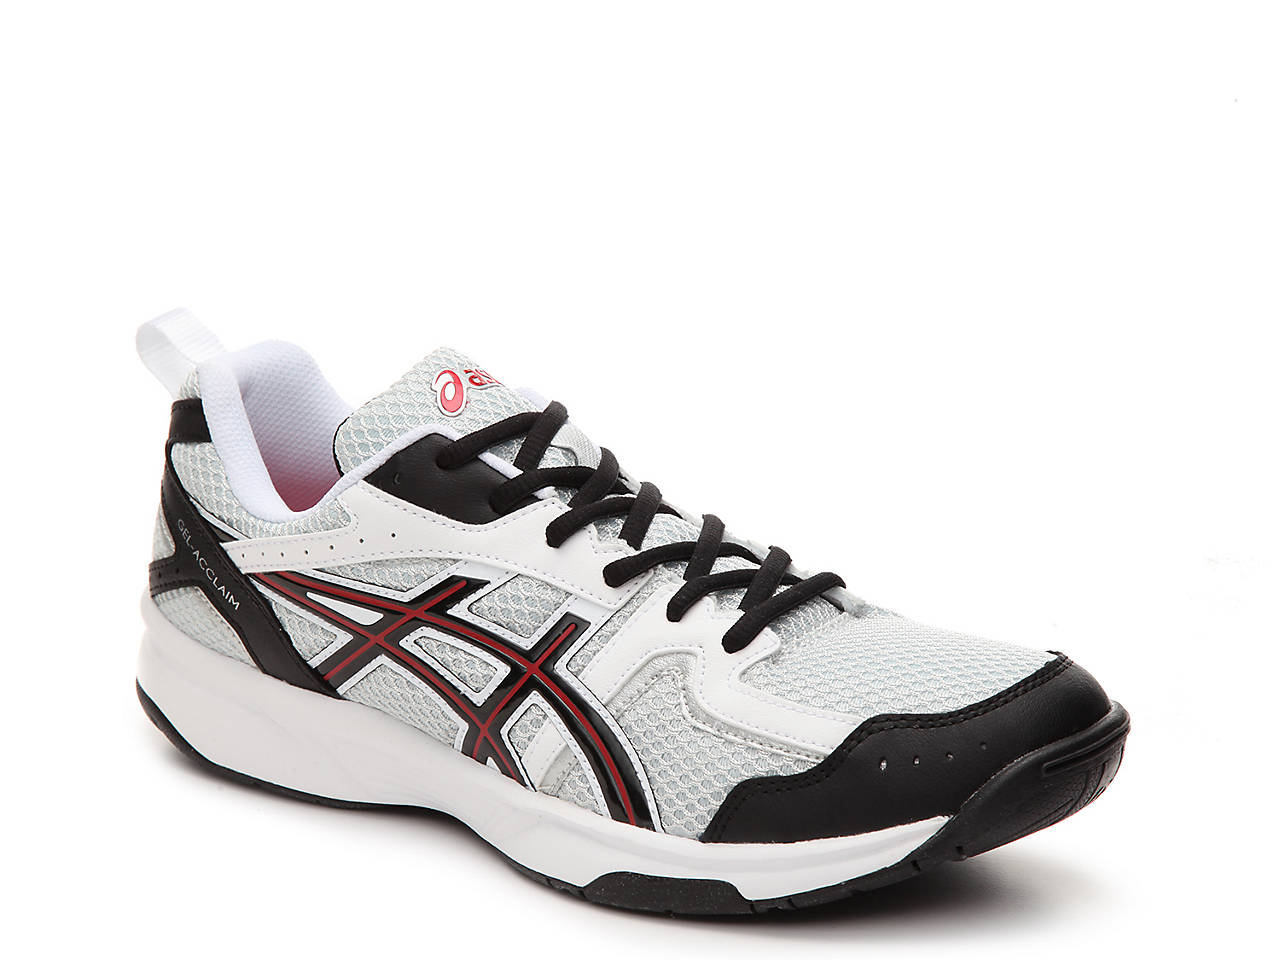 b927f5480045 ASICS GEL-Acclaim Training Shoe - Men s Men s Shoes